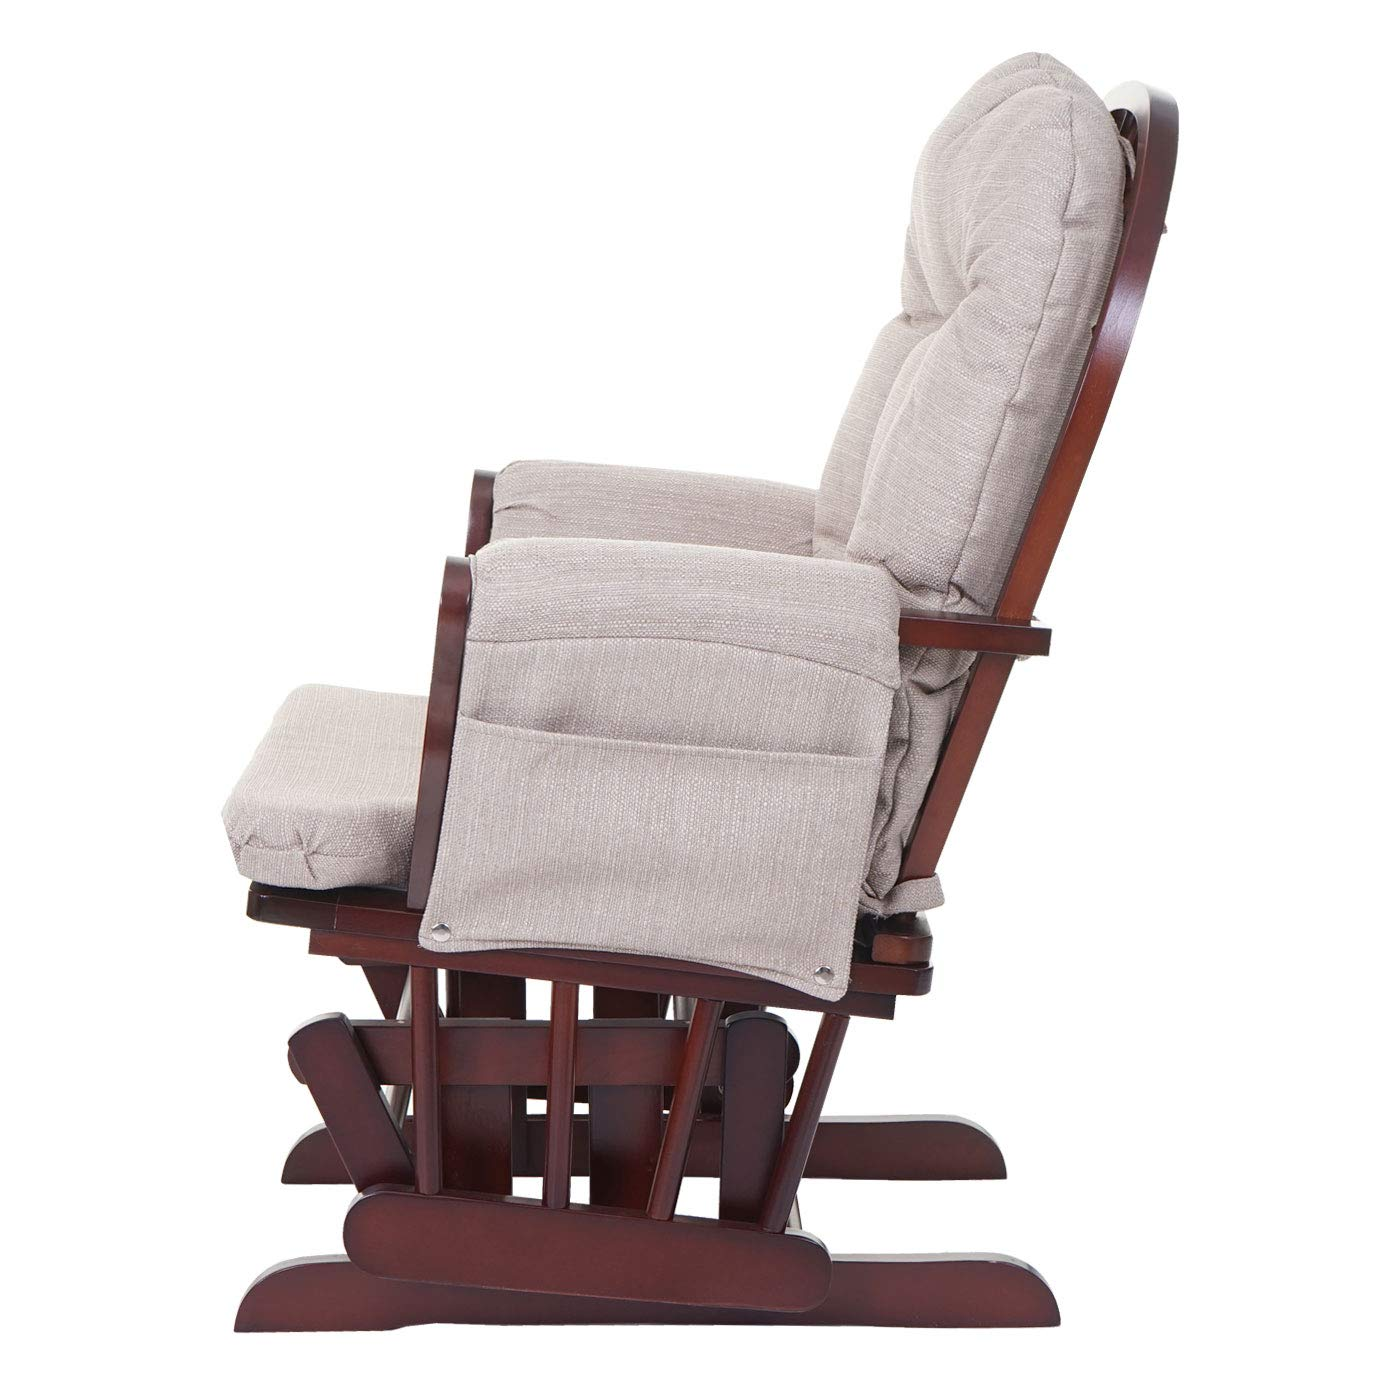 Mendler Relaxsessel HWC-C76 Stoff//Textil ~ Creme-grau Schaukelstuhl Stillstuhl Sessel Schwingstuhl Schwingsessel mit Hocker